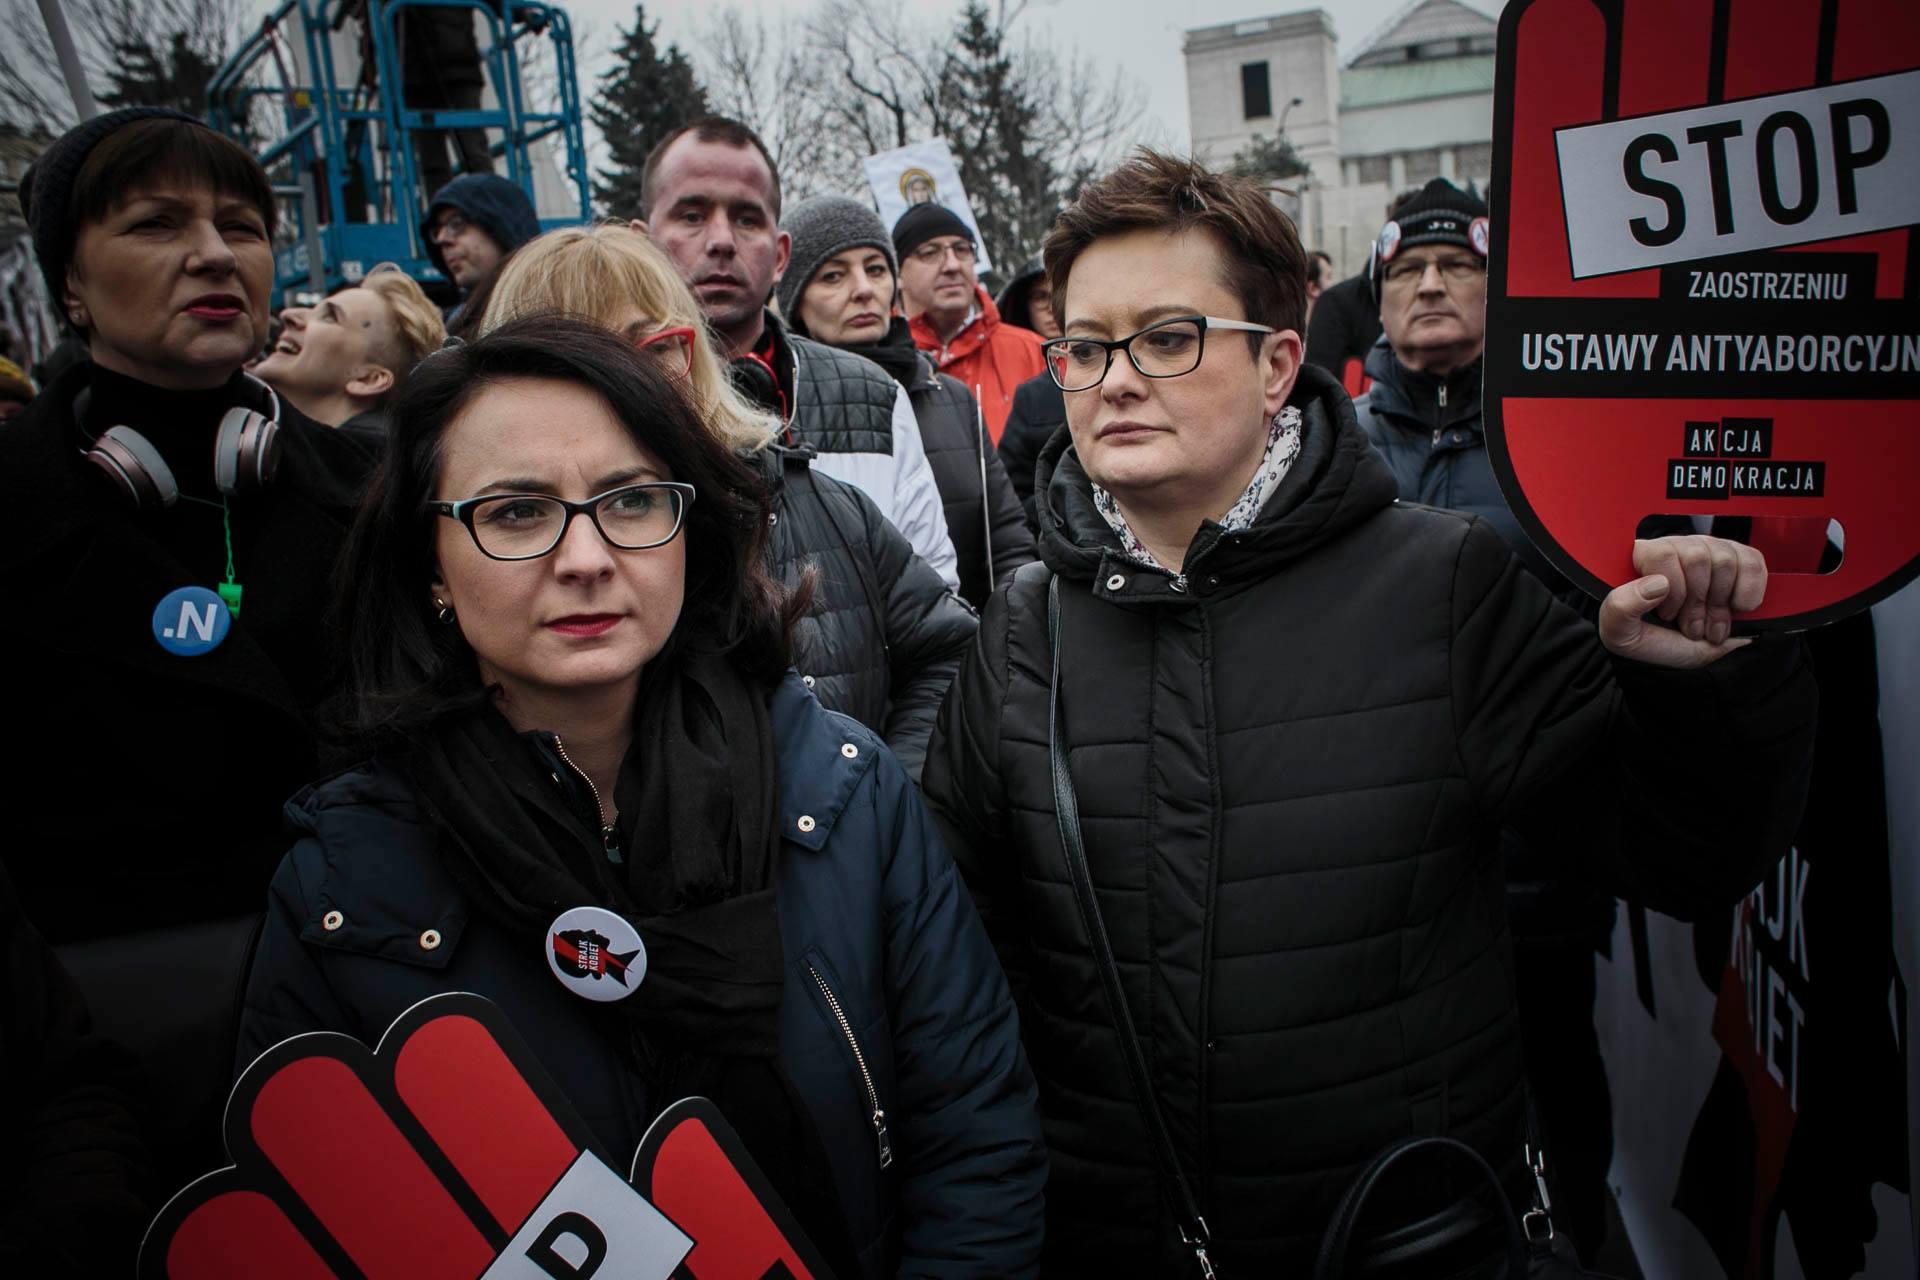 Kamila Gasiuk-Pihowicz/fot. profil posłanki na Facebook